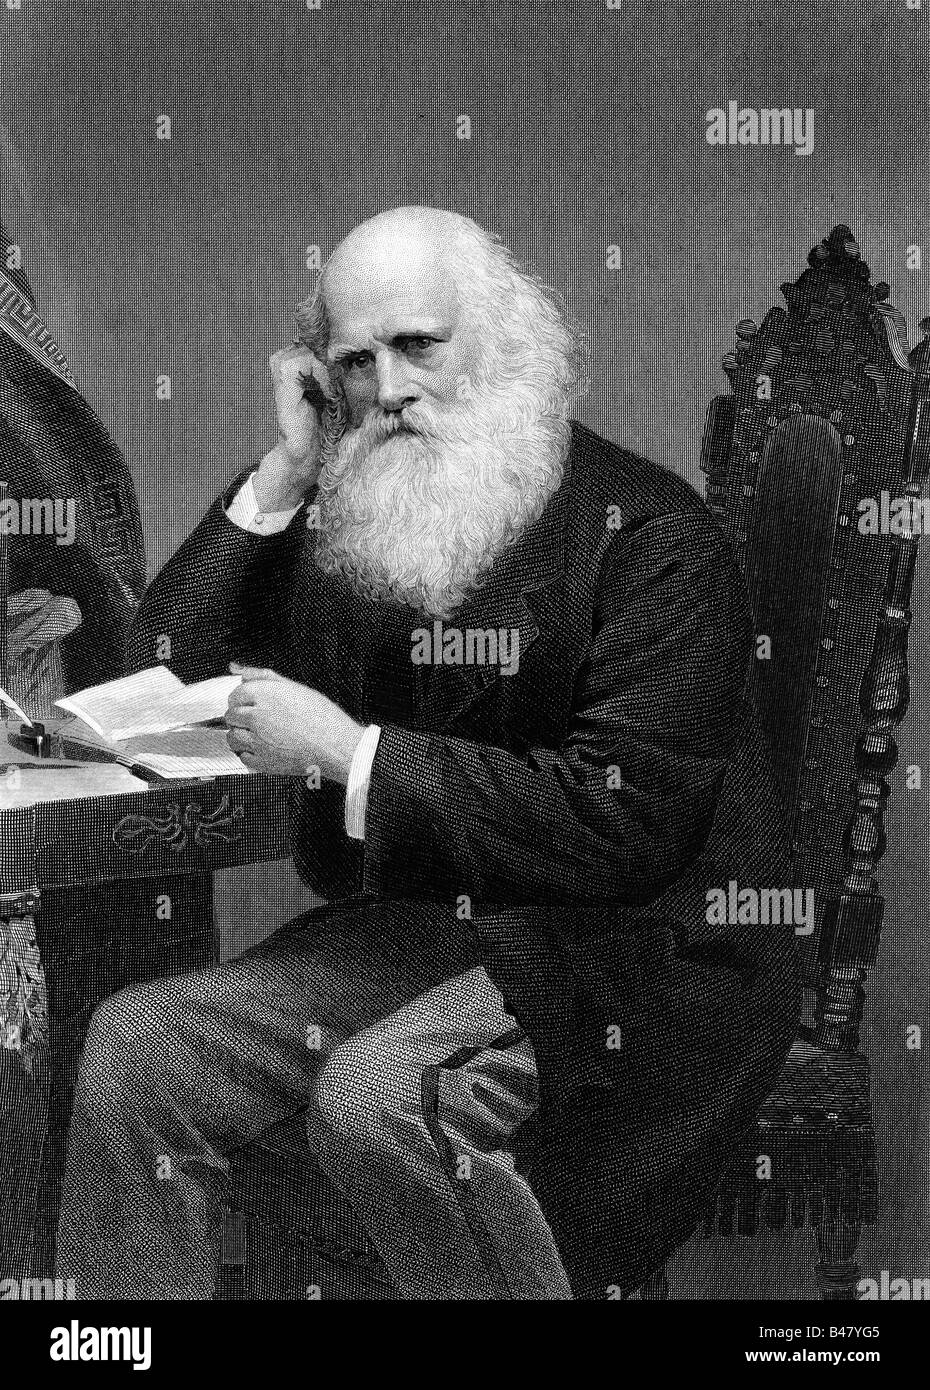 Bryant, William Cullen, 3 11 1794 - 12 6 1878, American